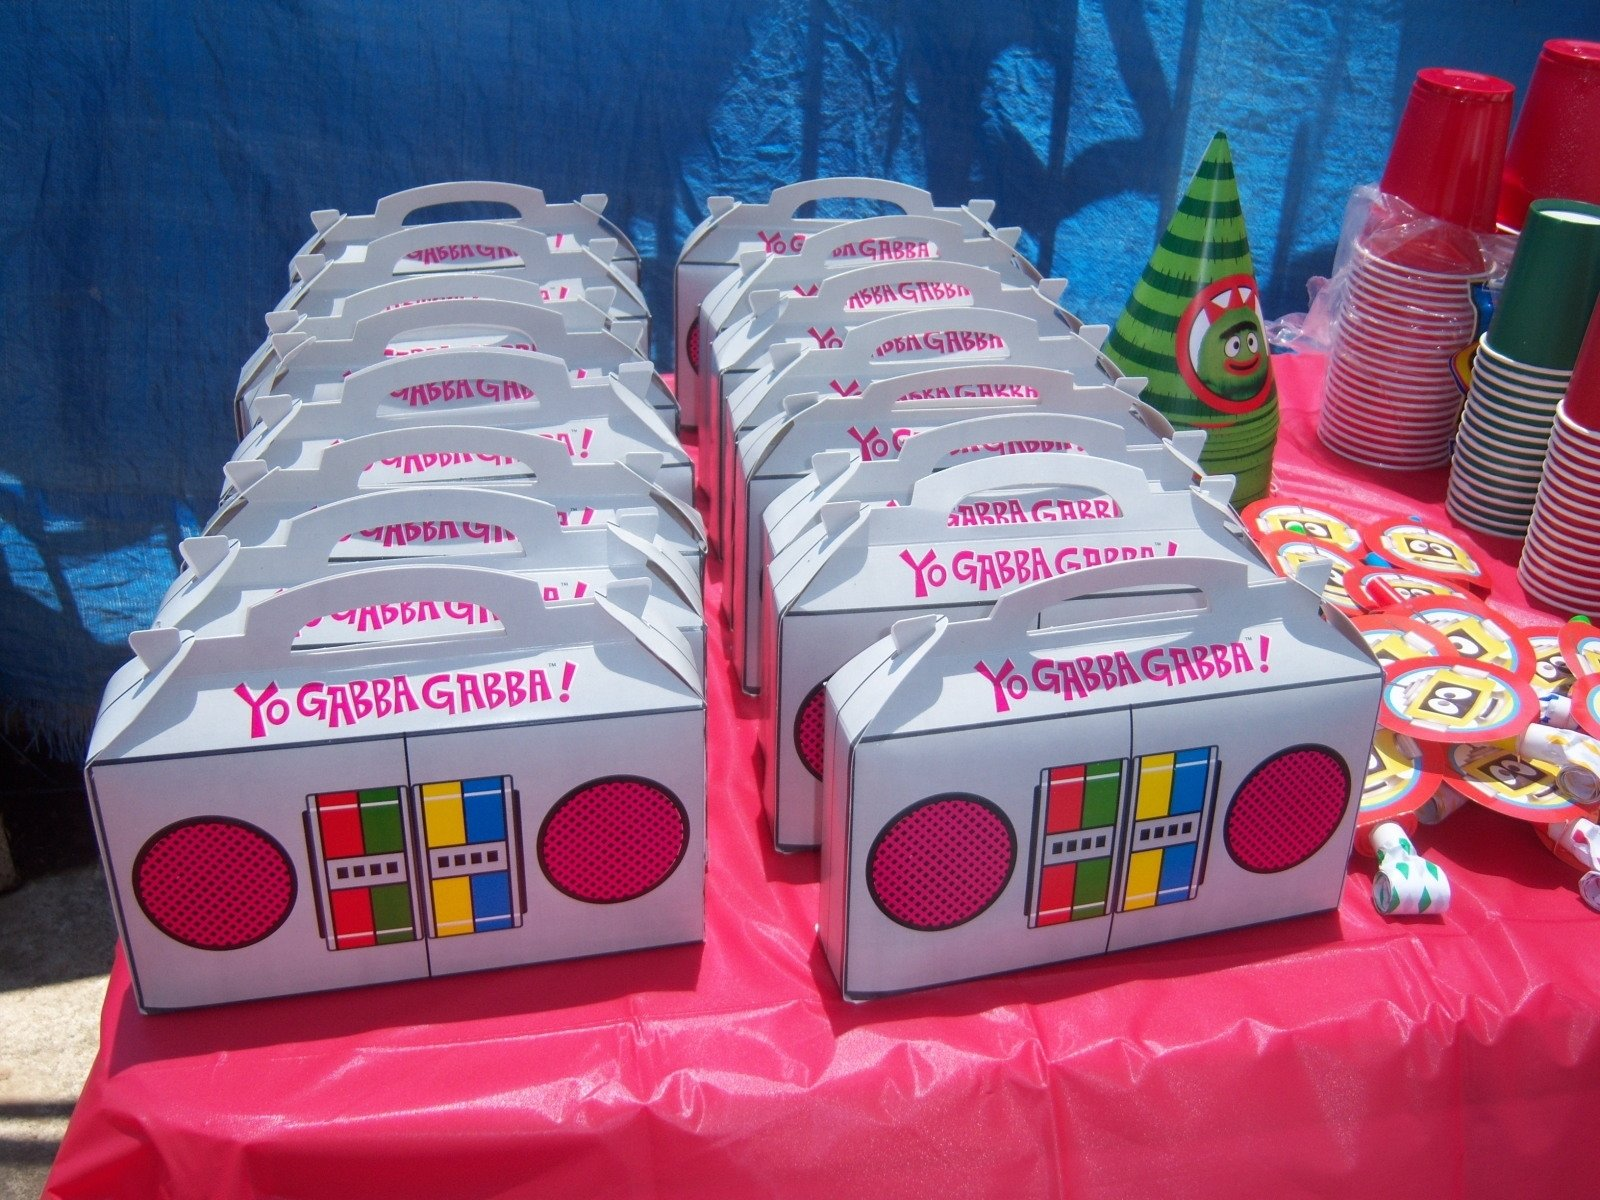 10 Attractive Yo Gabba Gabba Birthday Ideas finest yo gabba party ideas 5 25548 3